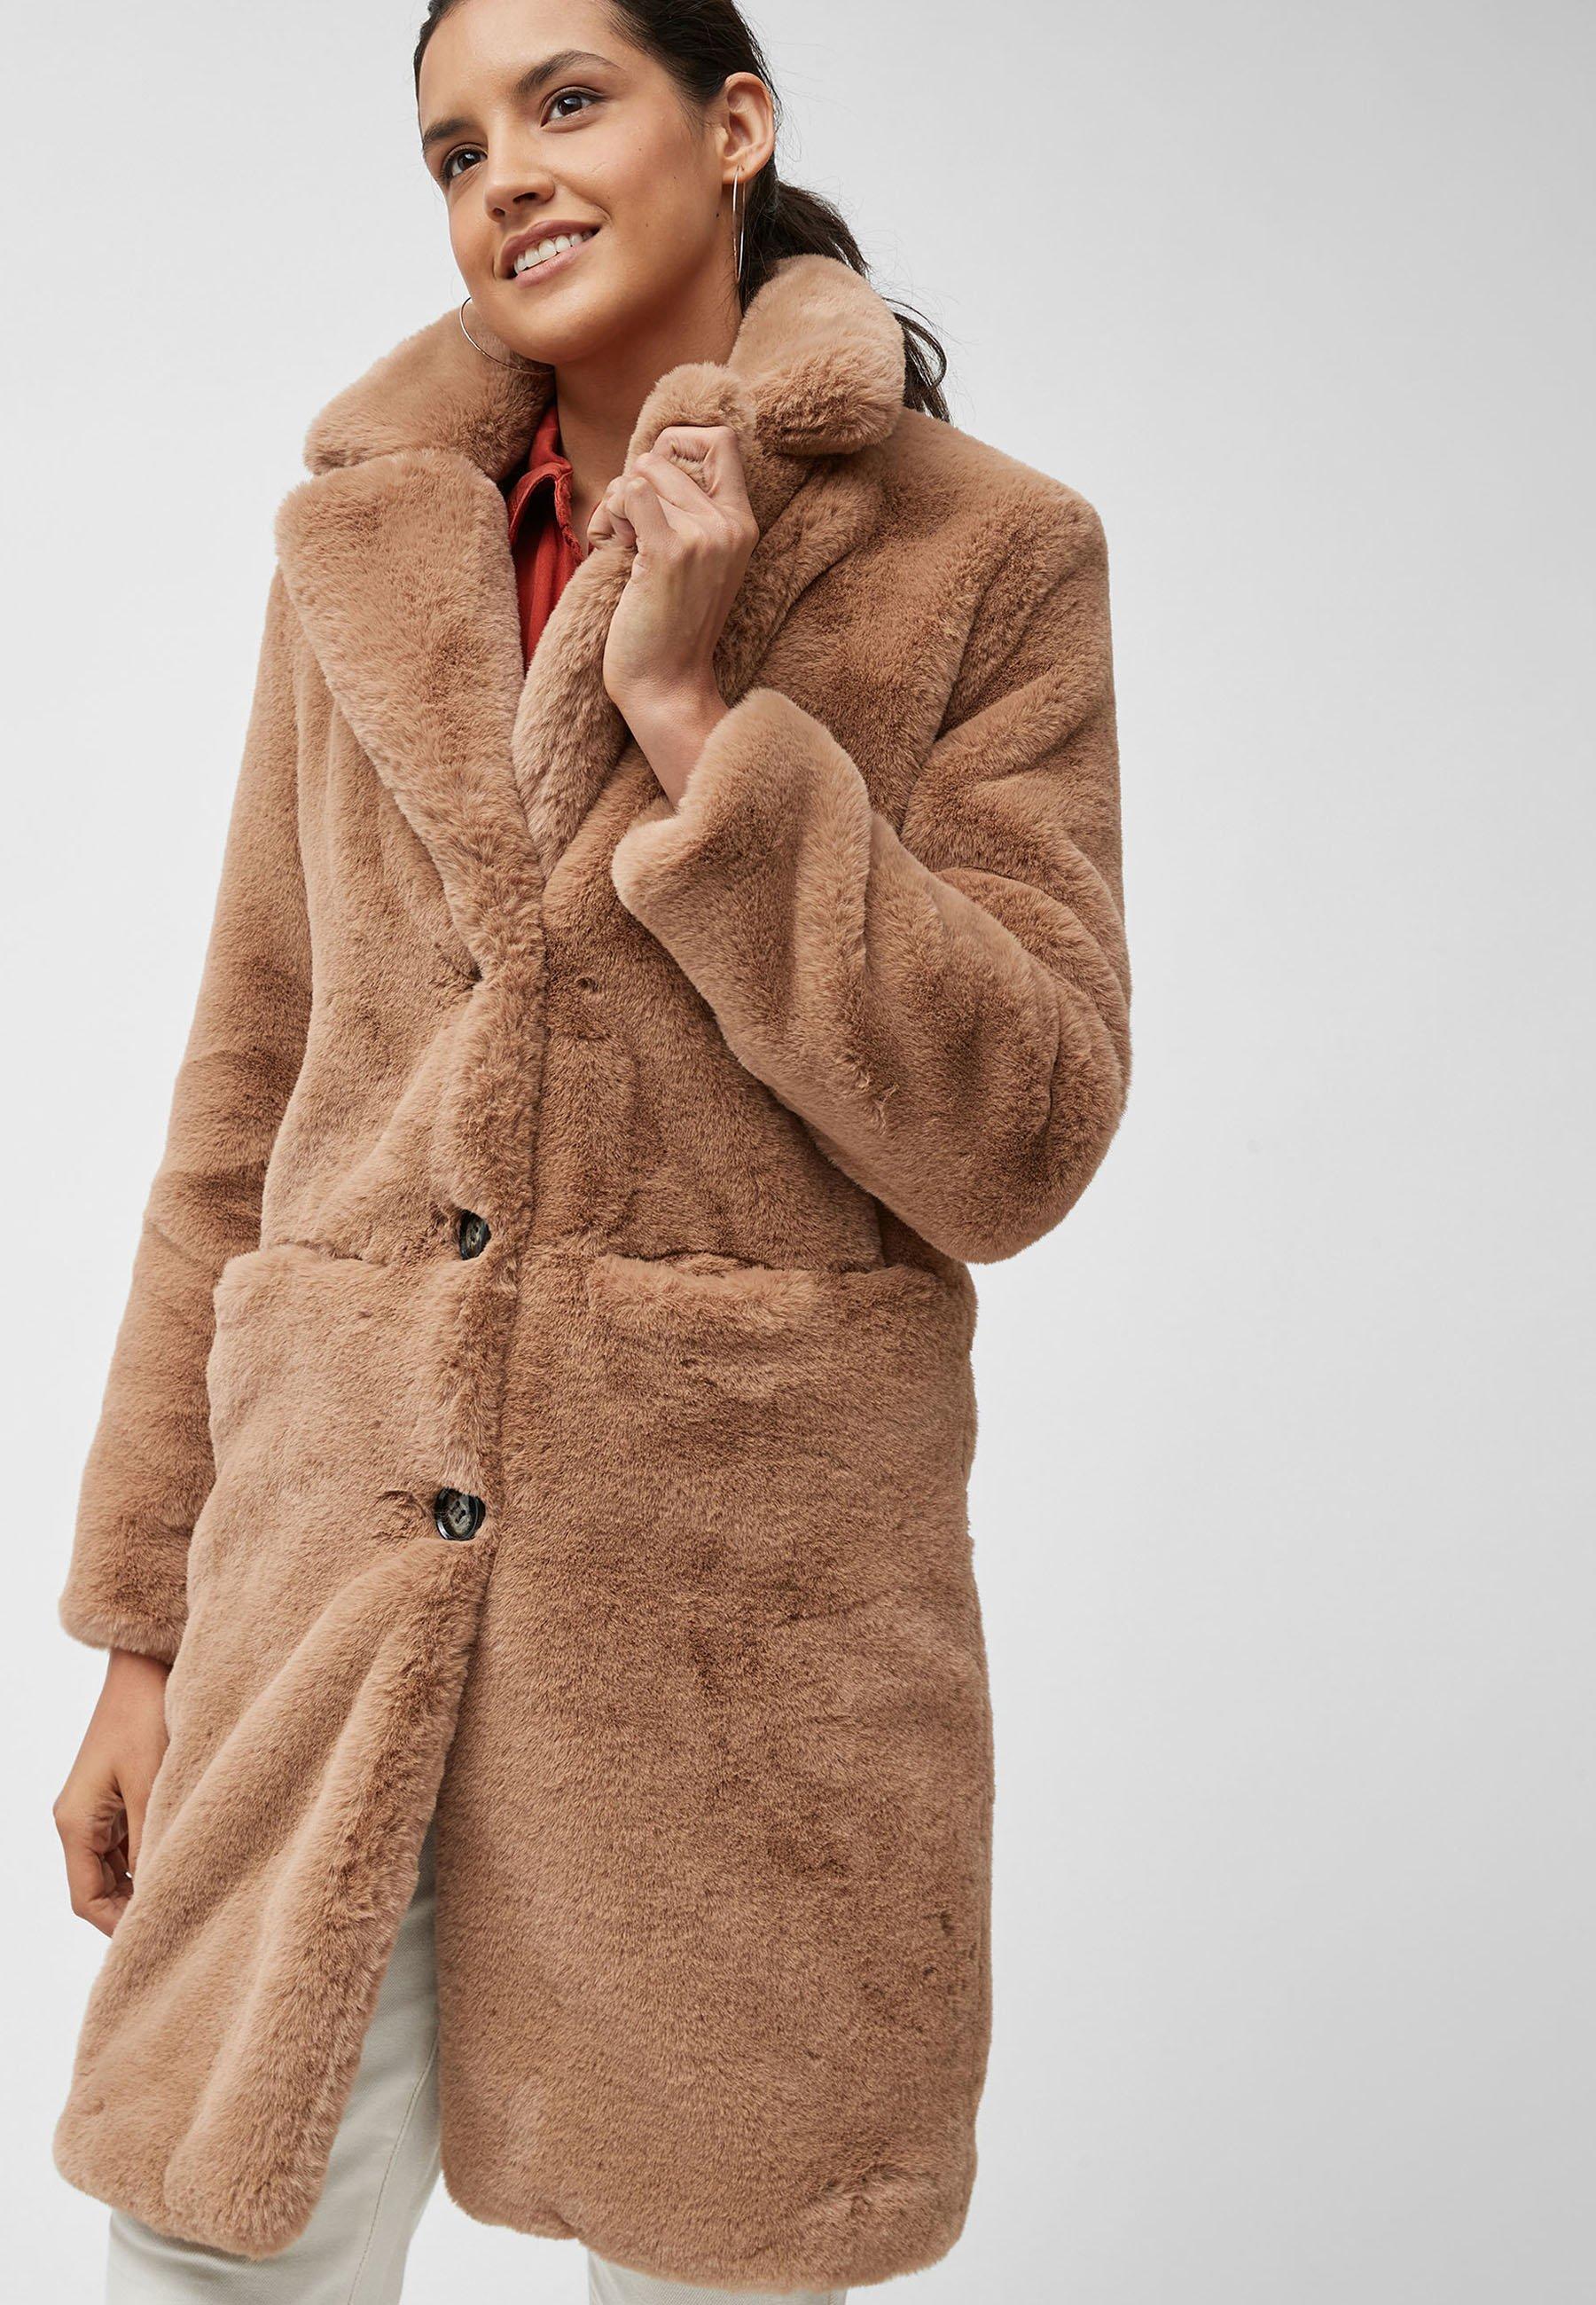 Donna CAMEL FAUX FUR COAT - Cappotto invernale